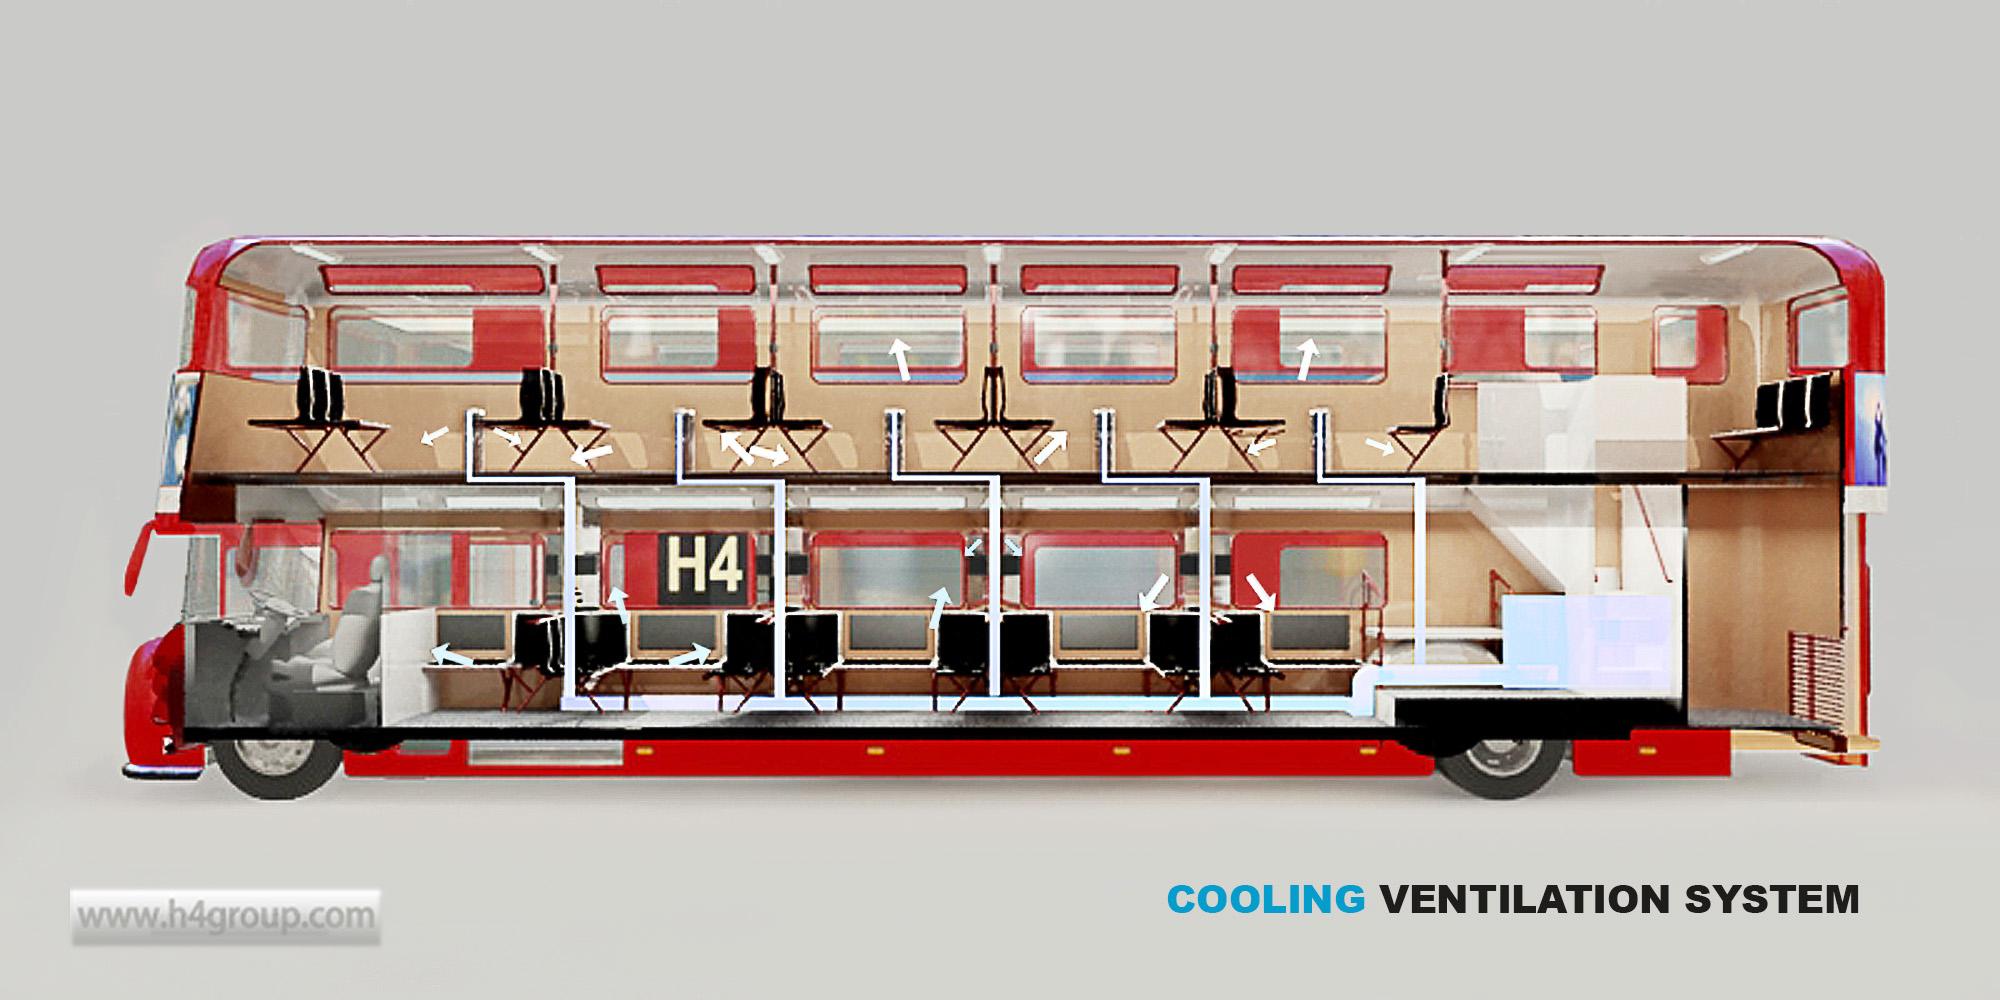 H4 Routemaster C.jpg